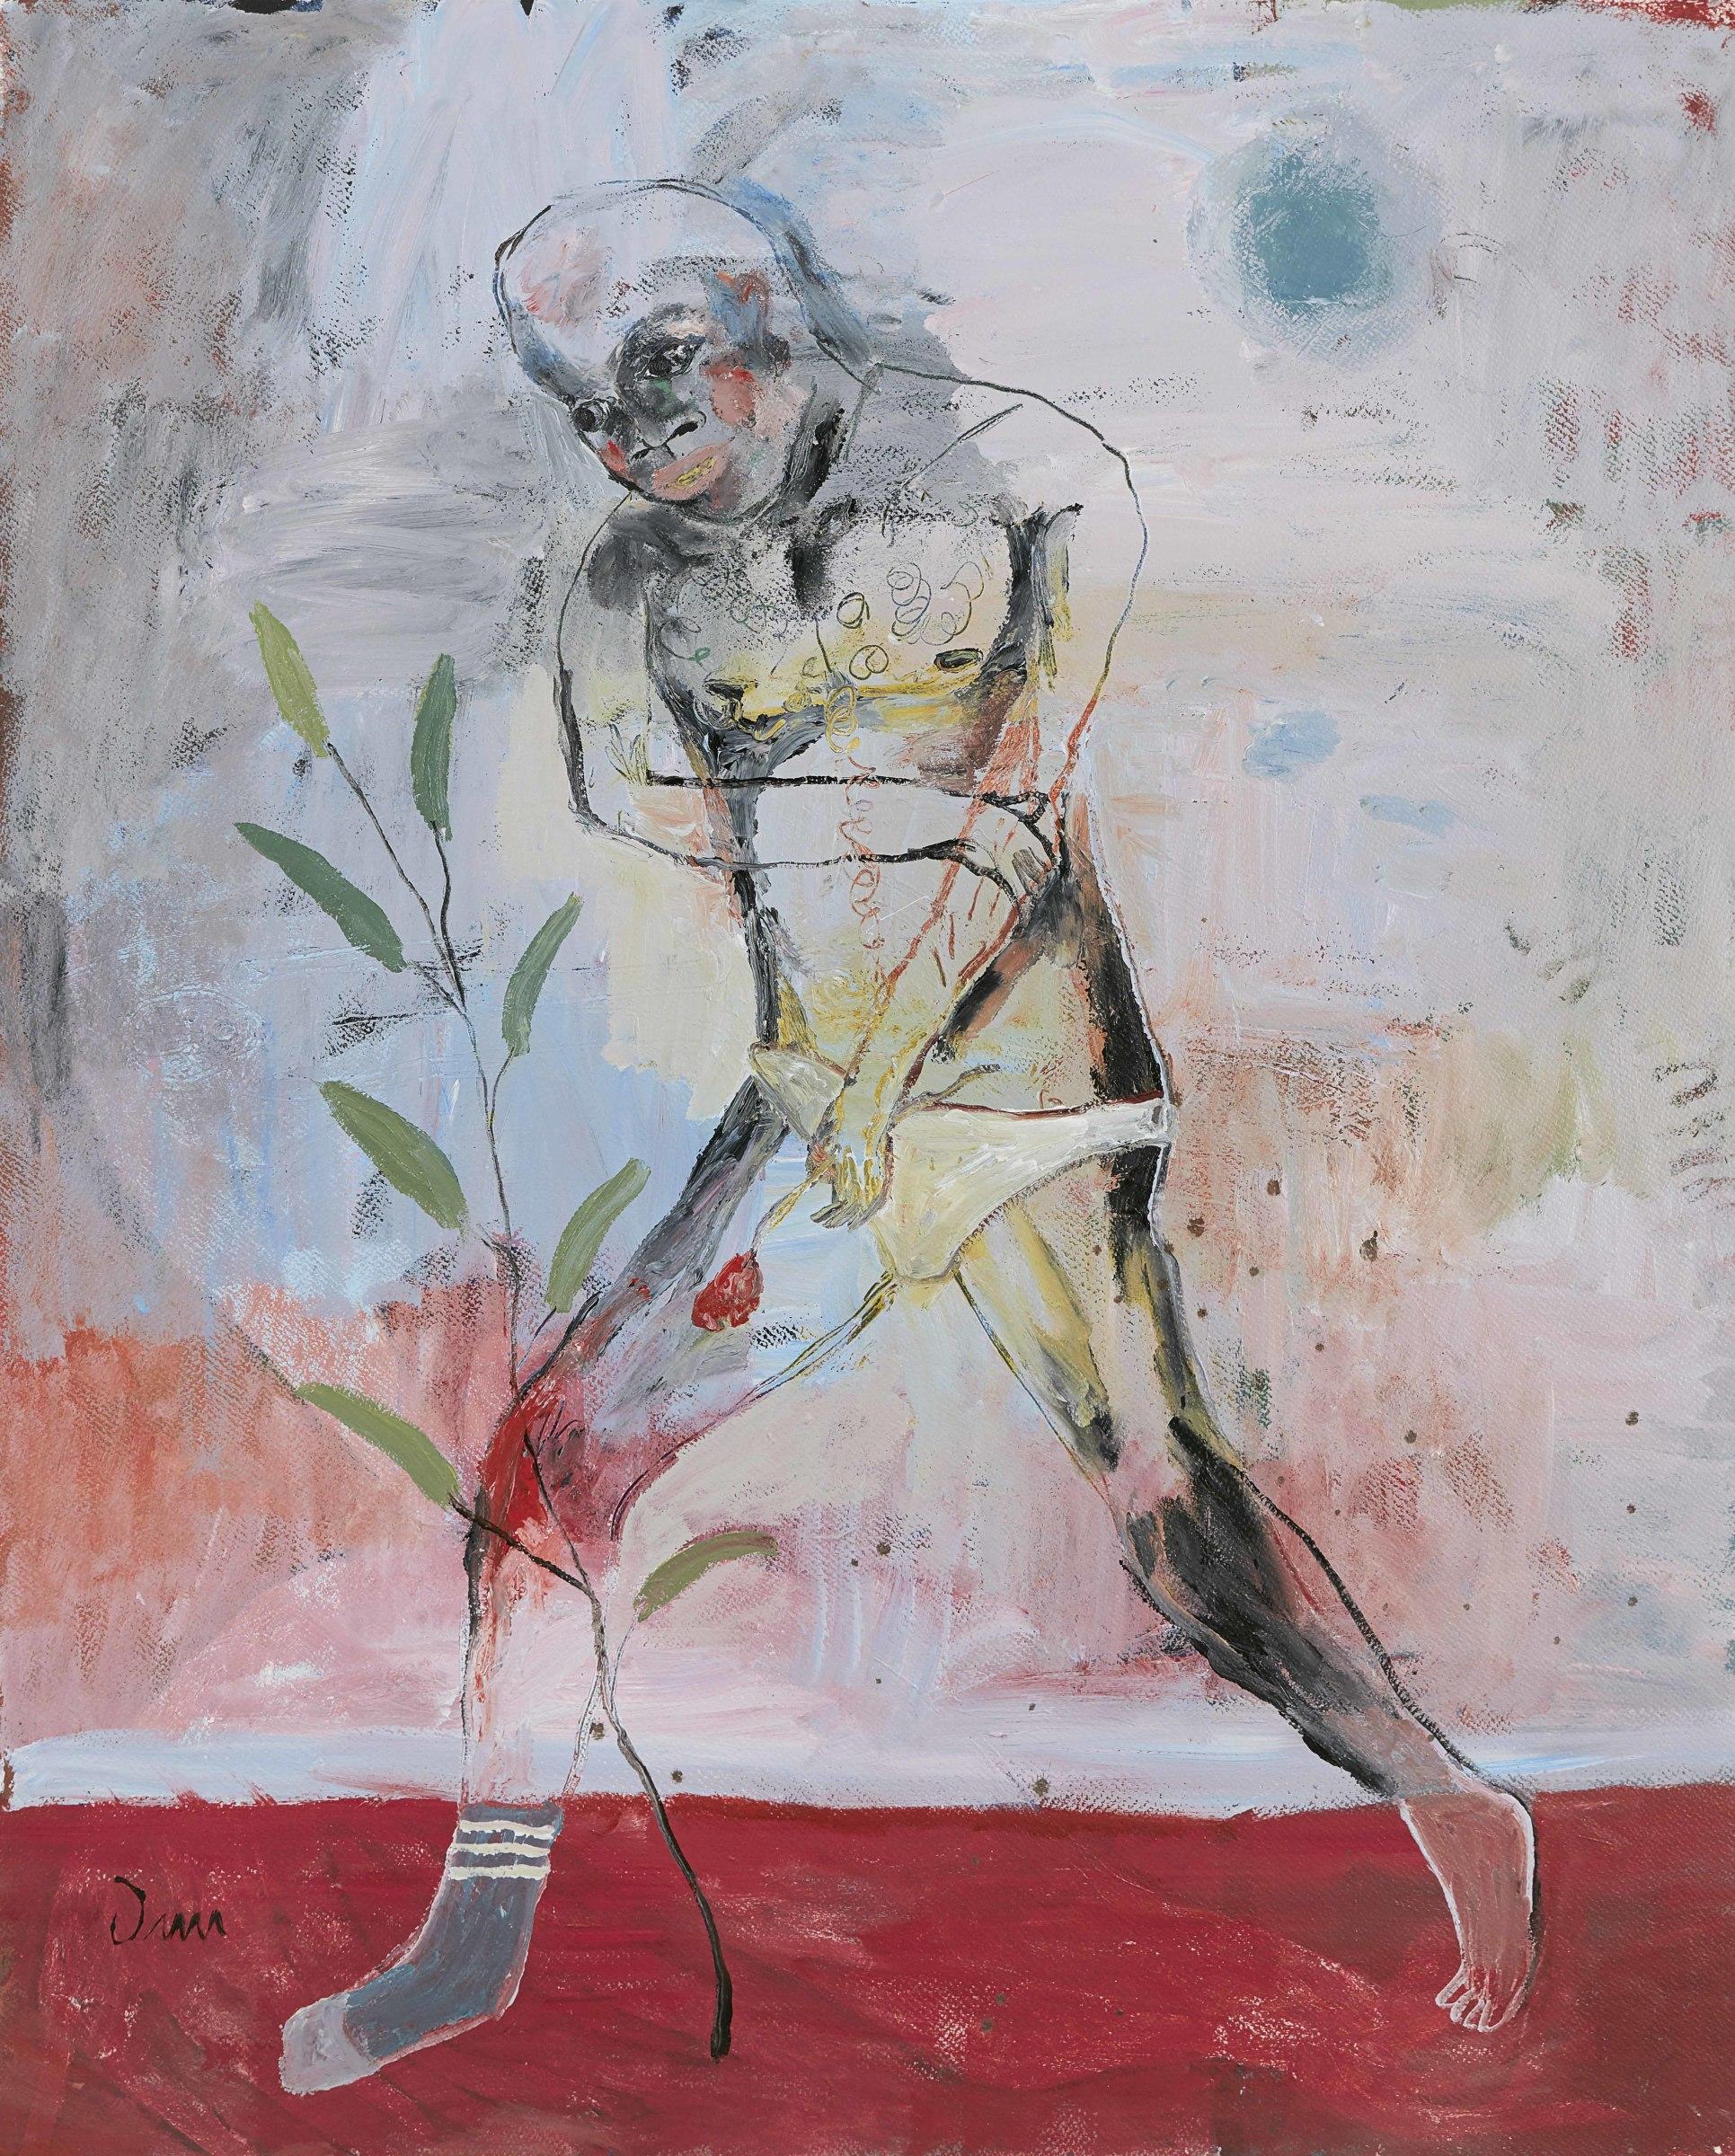 "<span class=""link fancybox-details-link""><a href=""/exhibitions/11/works/artworks3853/"">View Detail Page</a></span><div class=""artist""><strong>John-Michael Metelerkamp</strong></div> 1982 -<div class=""title""><em>Blue Marrow</em>, 2017</div><div class=""medium"">Acrylic on paper</div><div class=""dimensions"">1320x1050mm</div>"